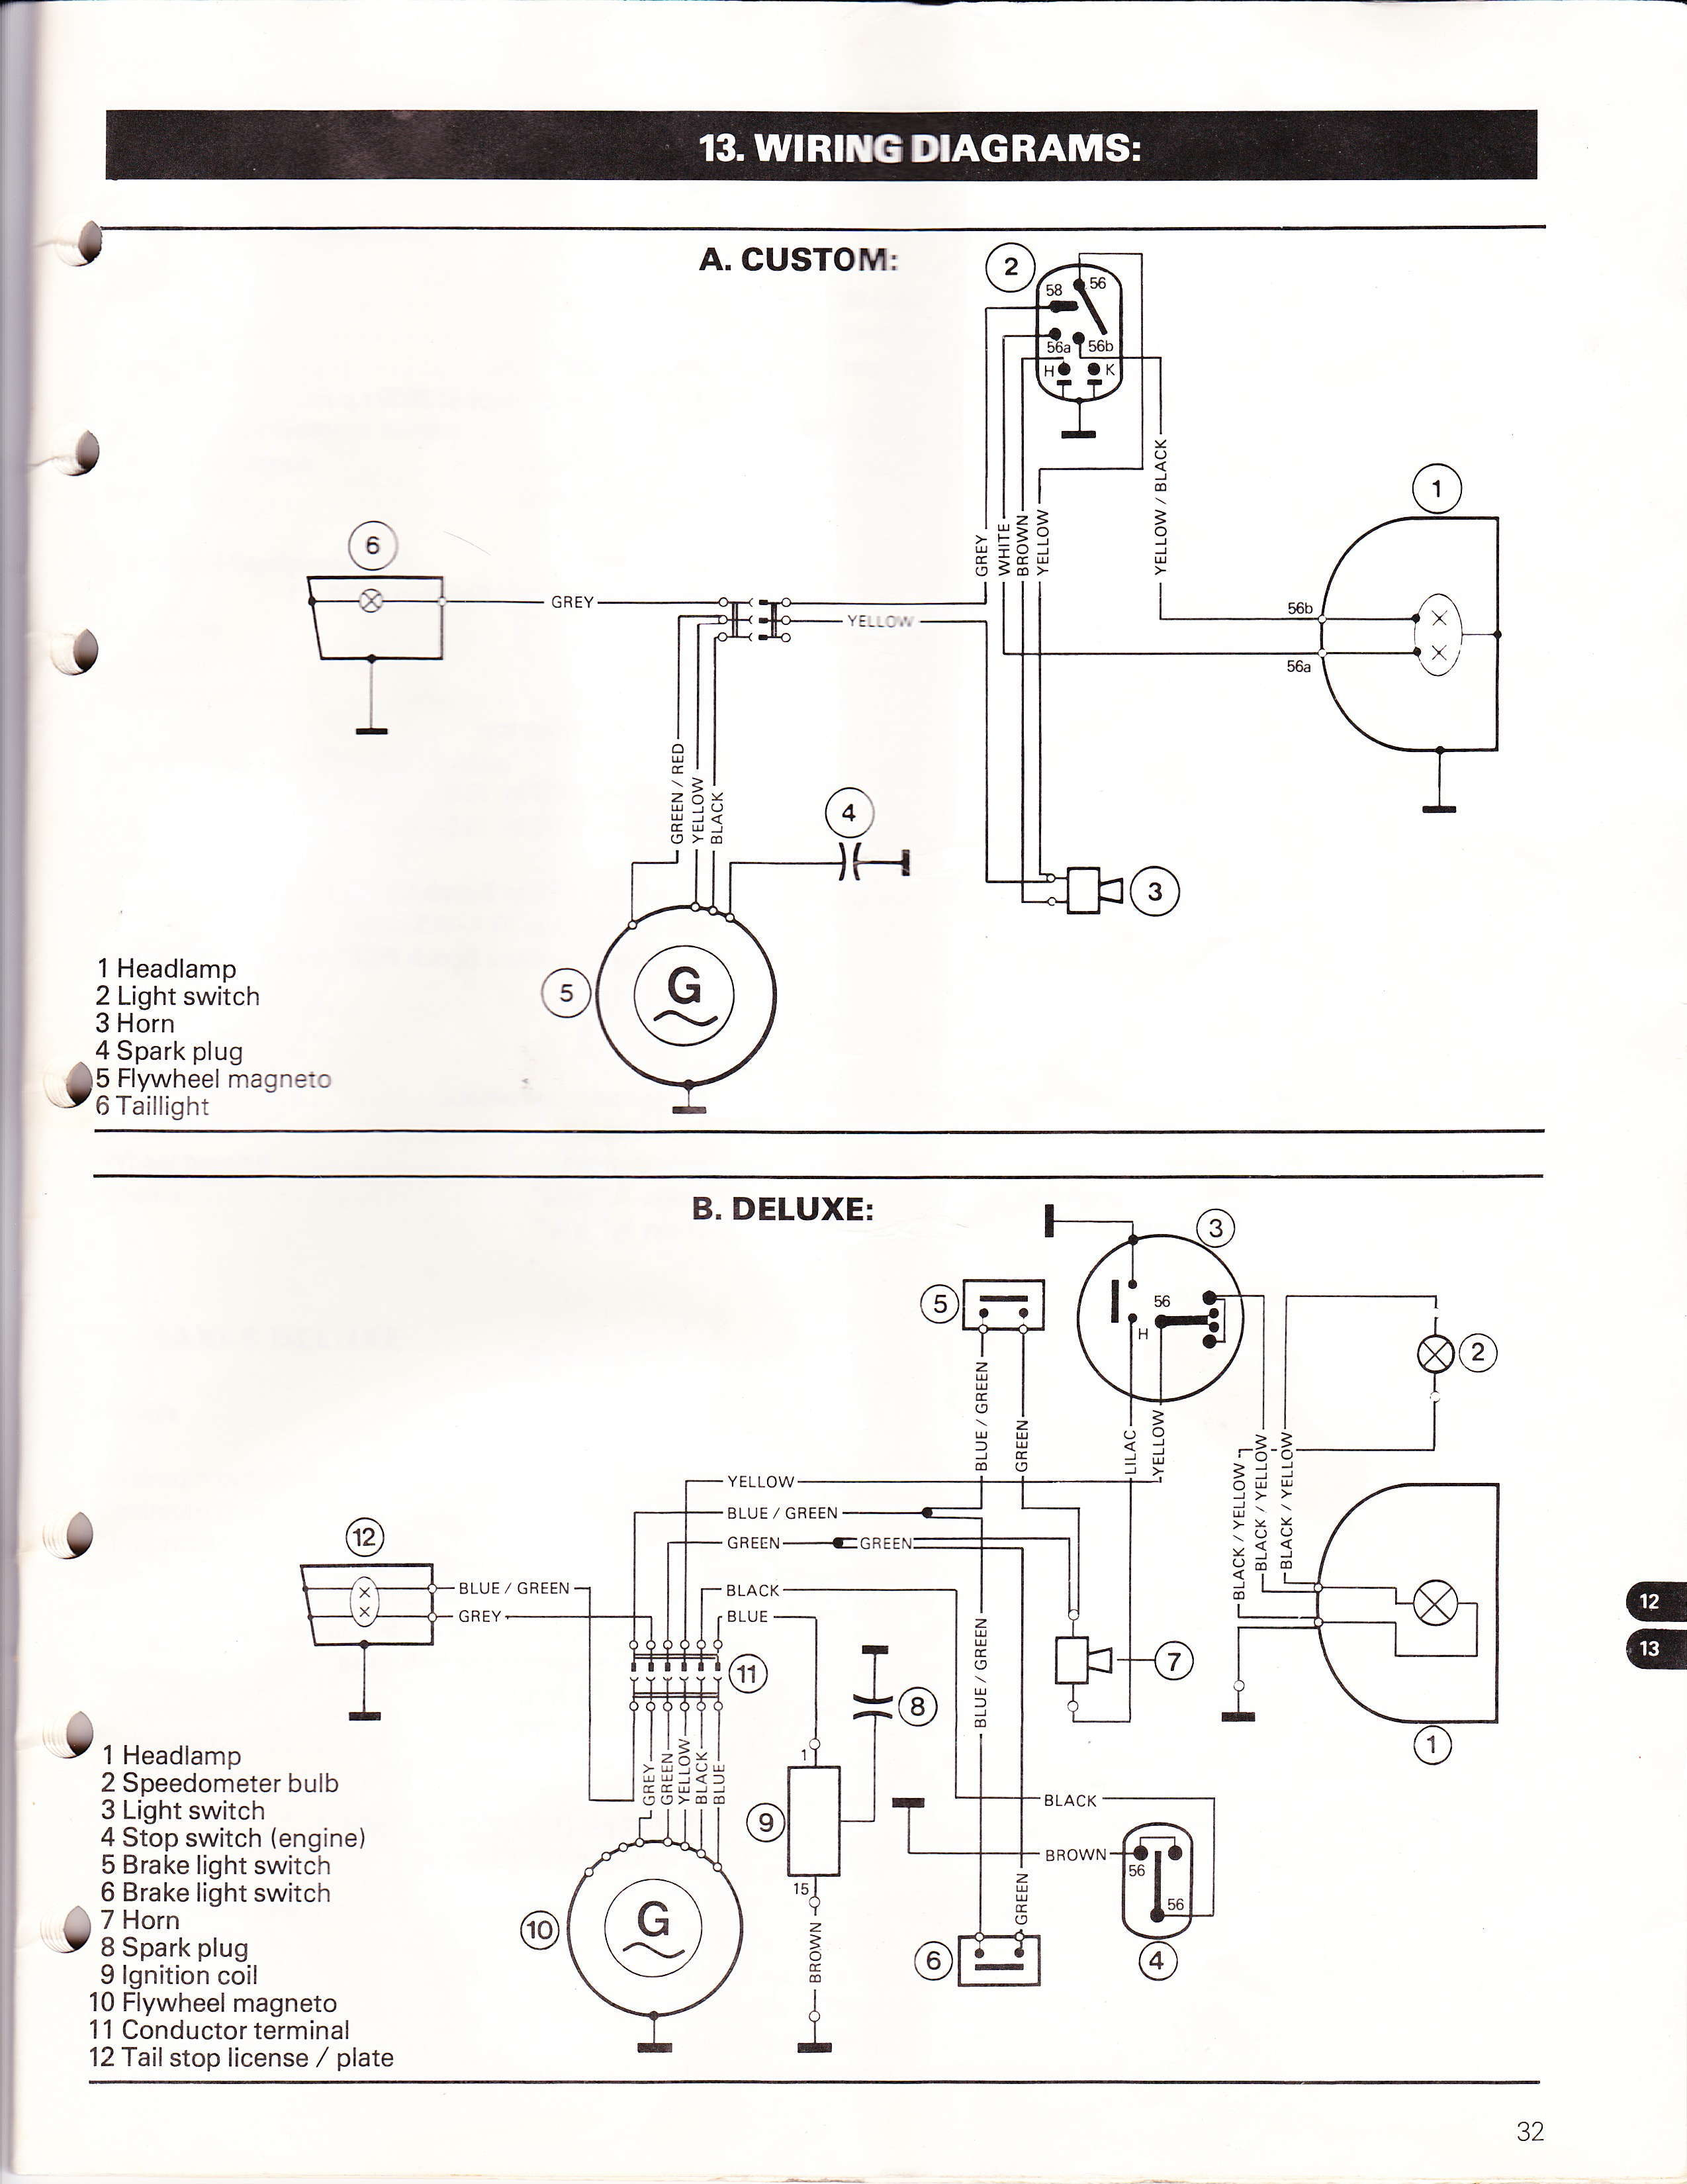 Wiring Harness Wiki